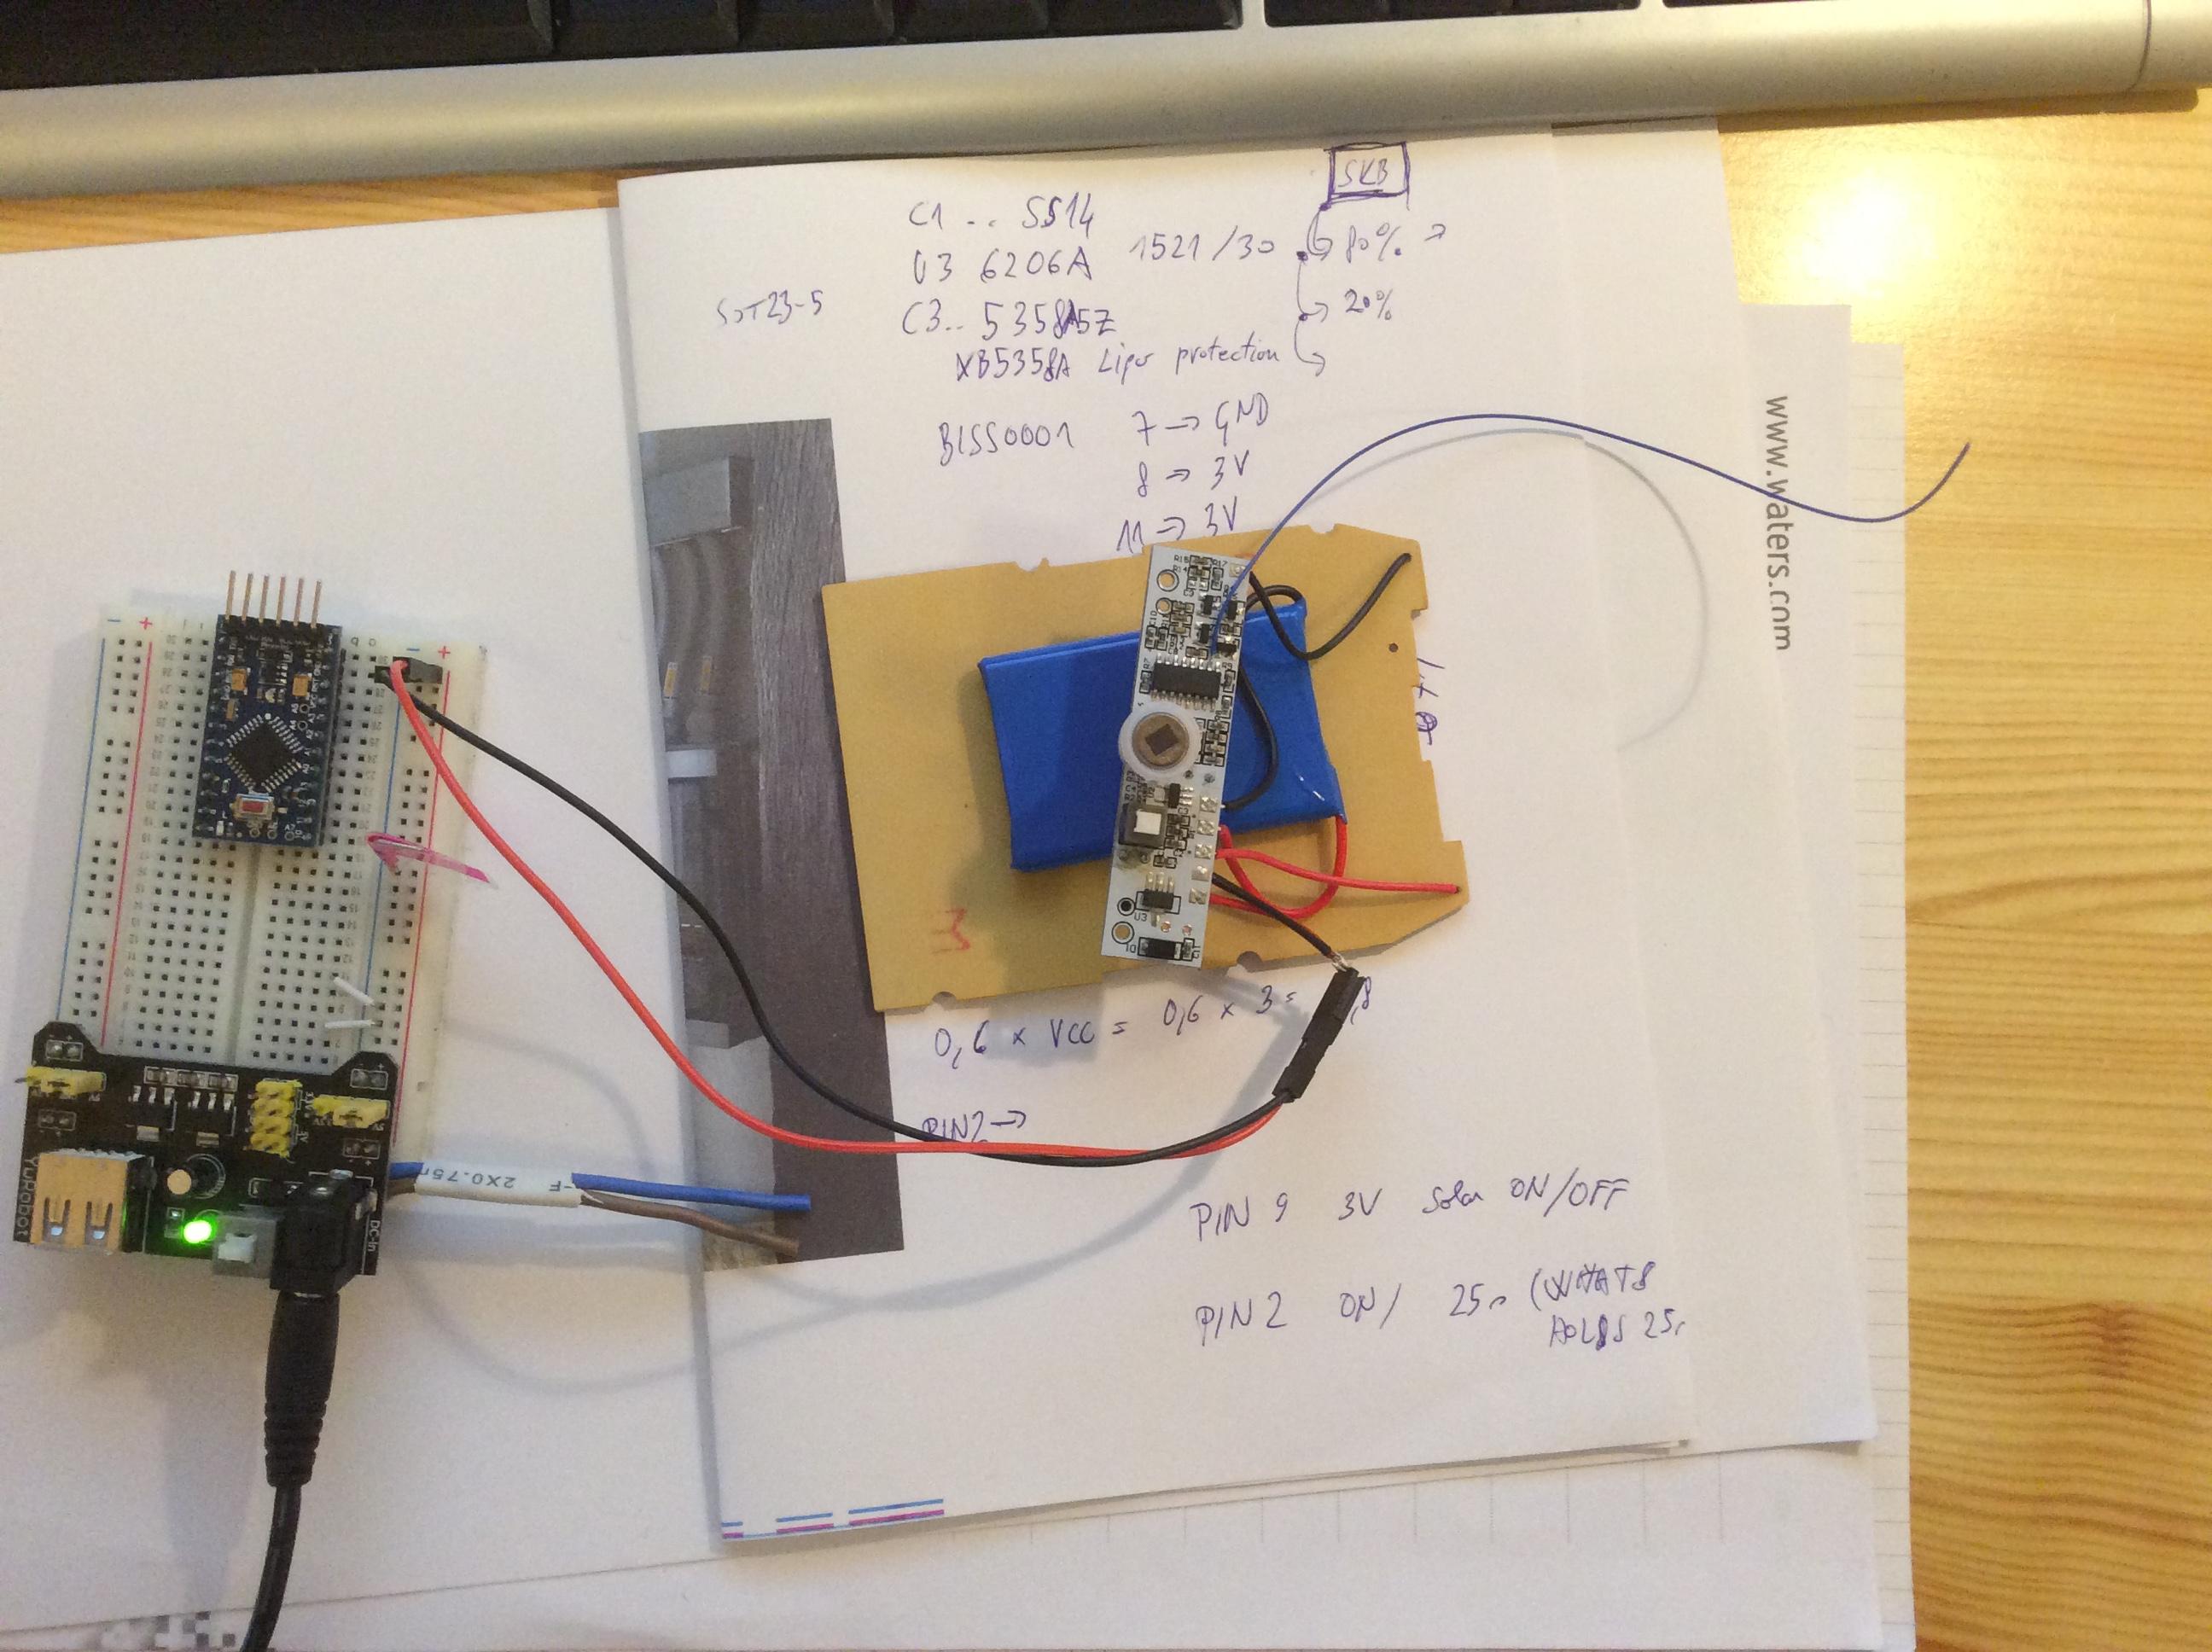 Chinese Solar Lipo Powered Pir Led Lamp Mysensors Forum Circuit Board Wiring Diagram Besides Motion Sensor